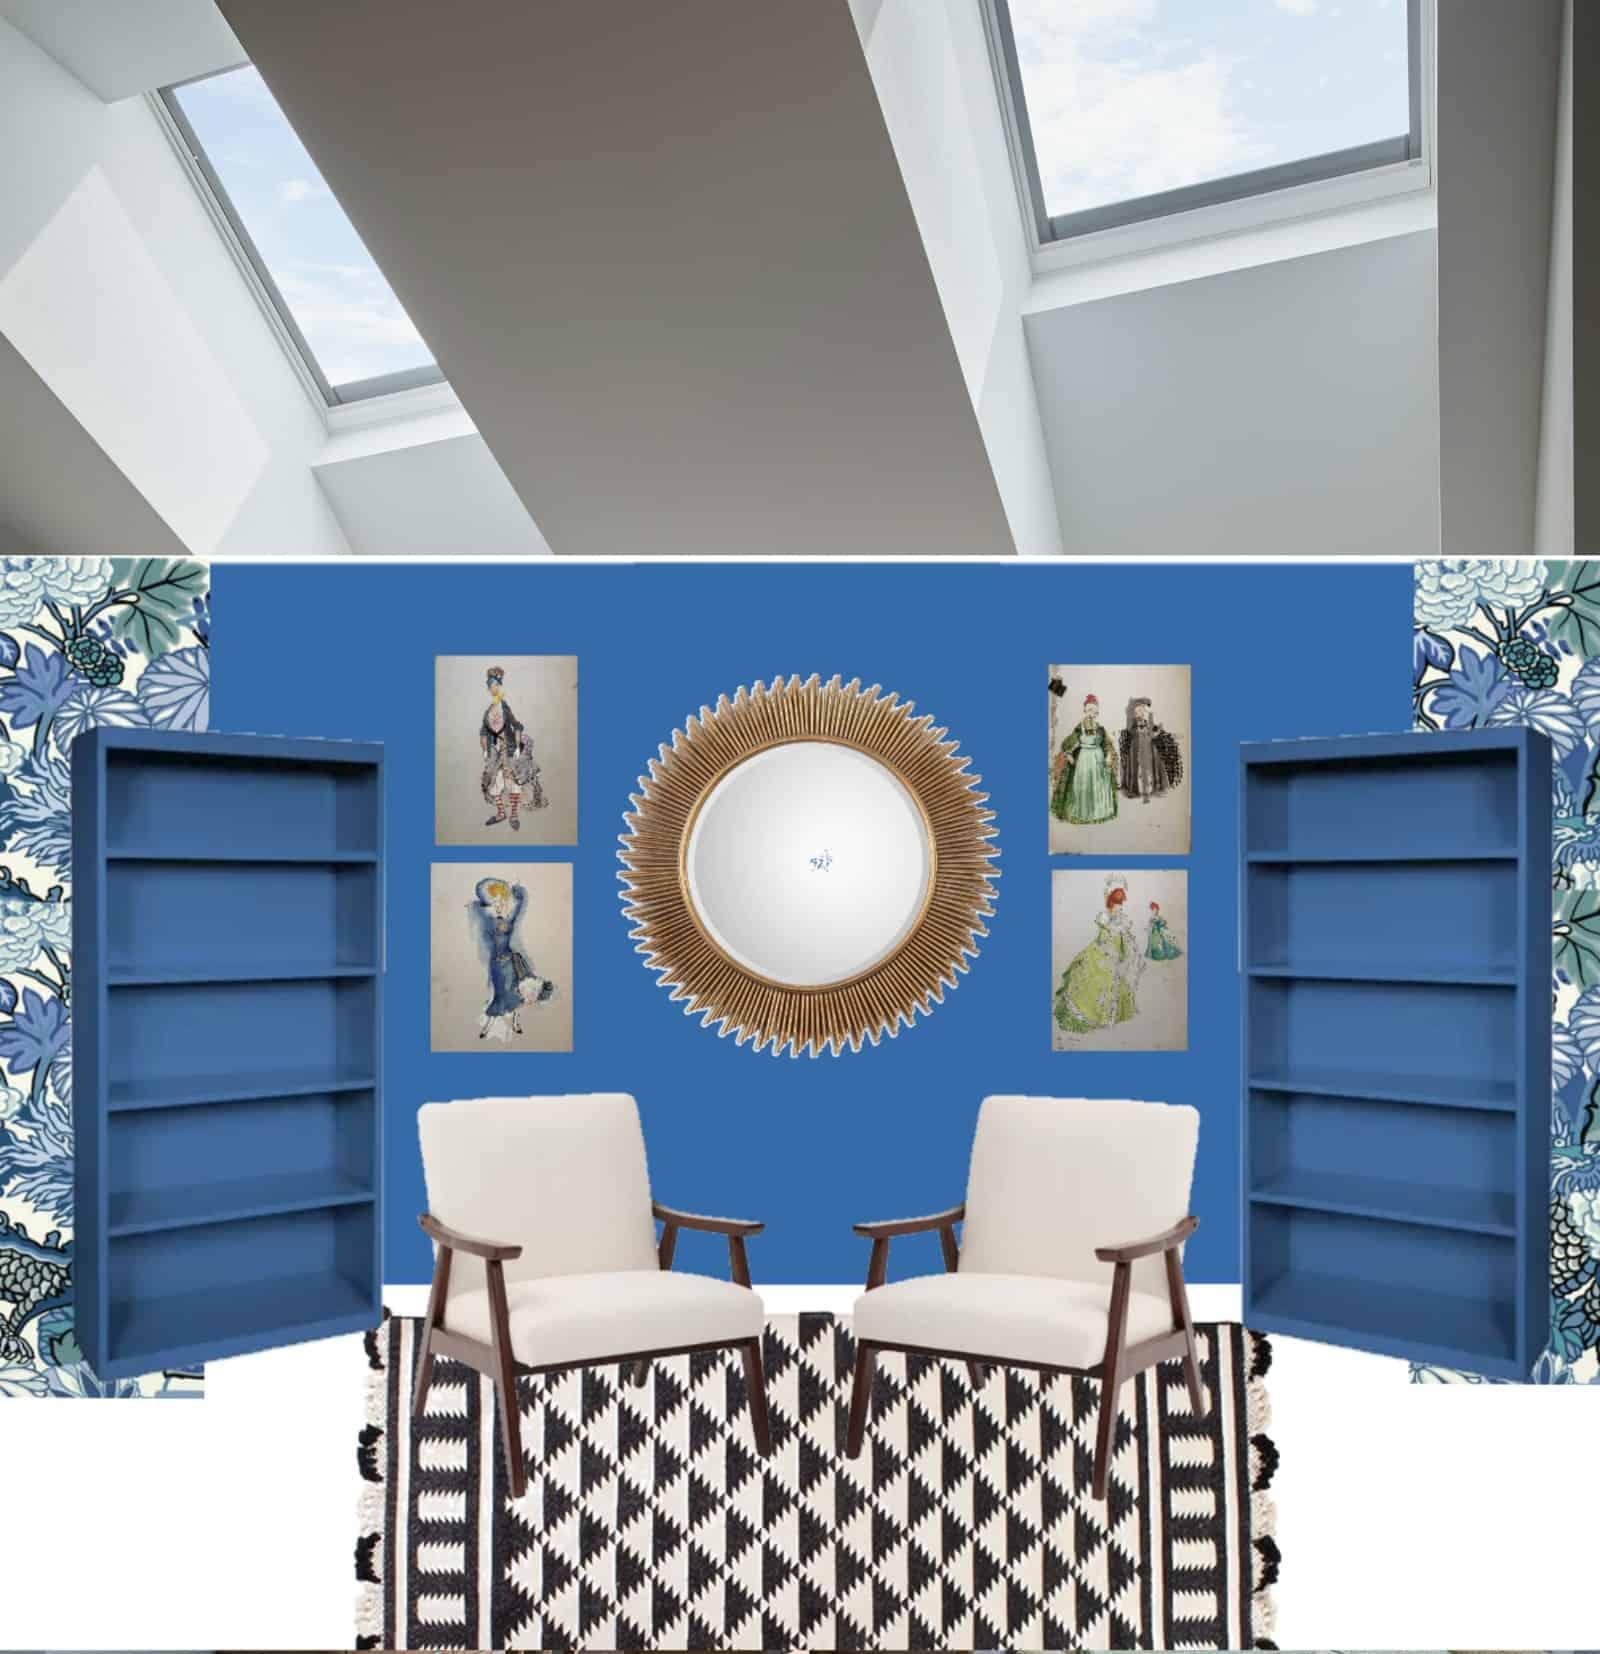 blue room with skylights overhead